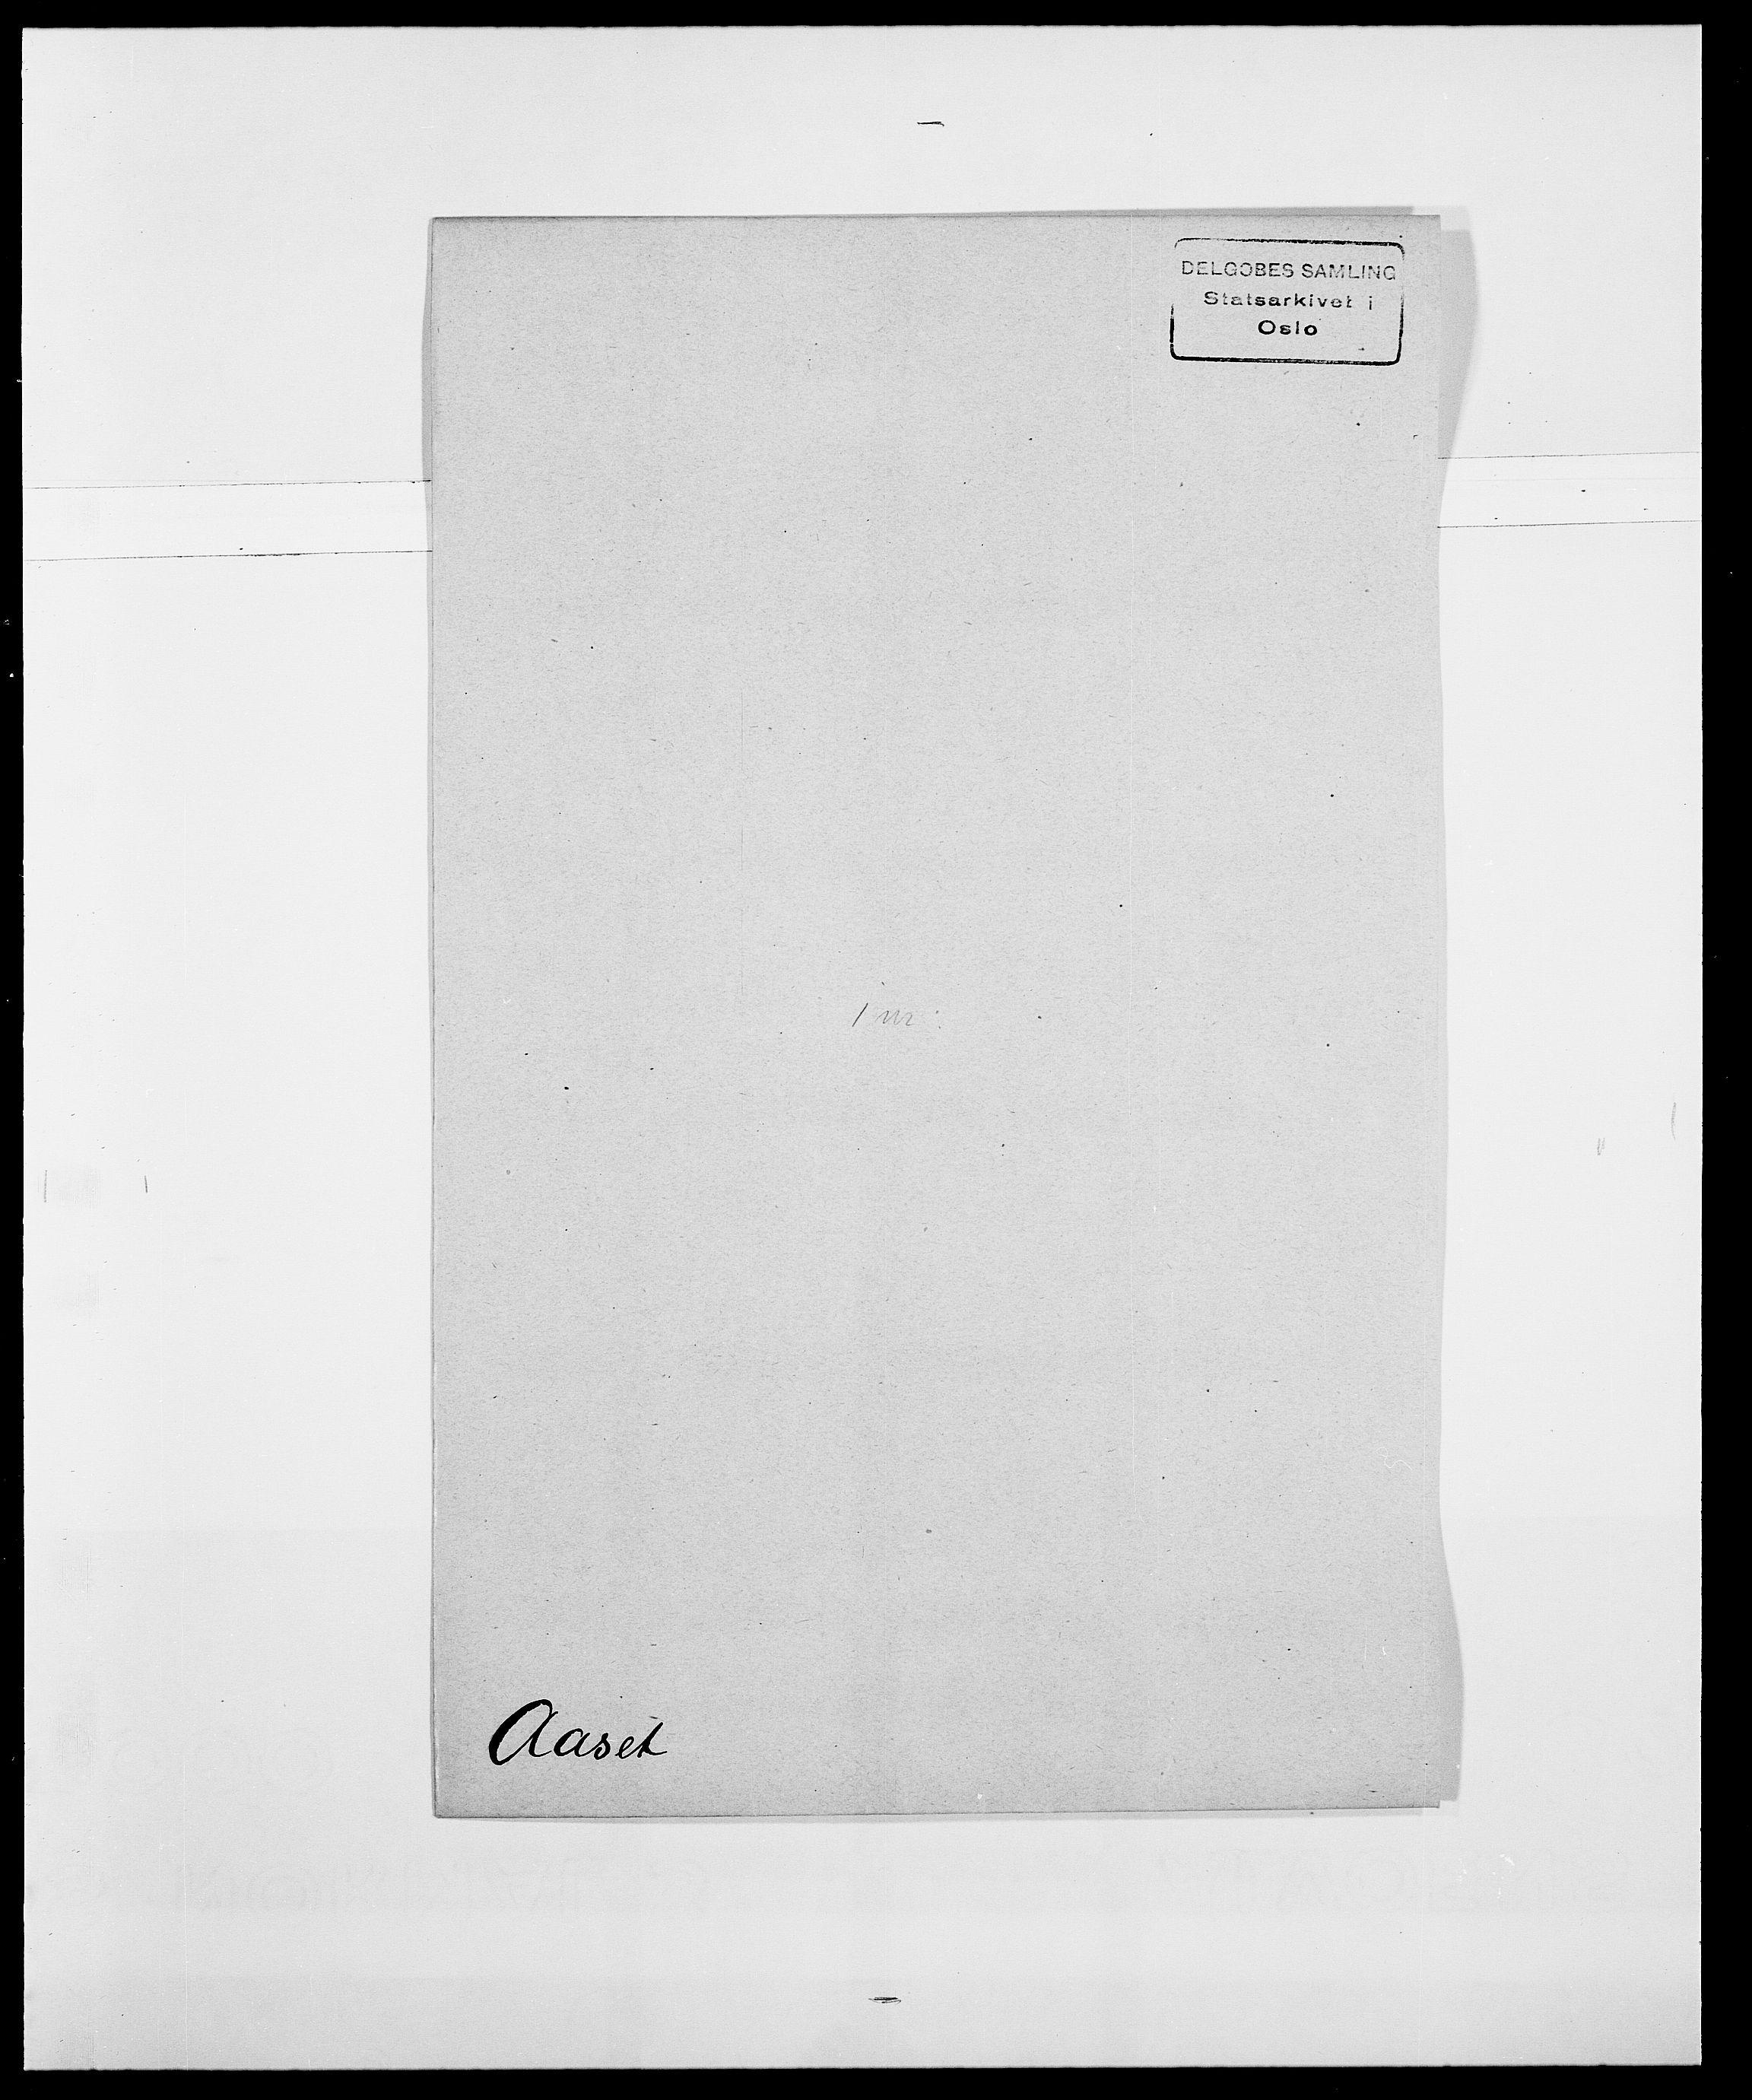 SAO, Delgobe, Charles Antoine - samling, D/Da/L0001: Aabye - Angerman, s. 156